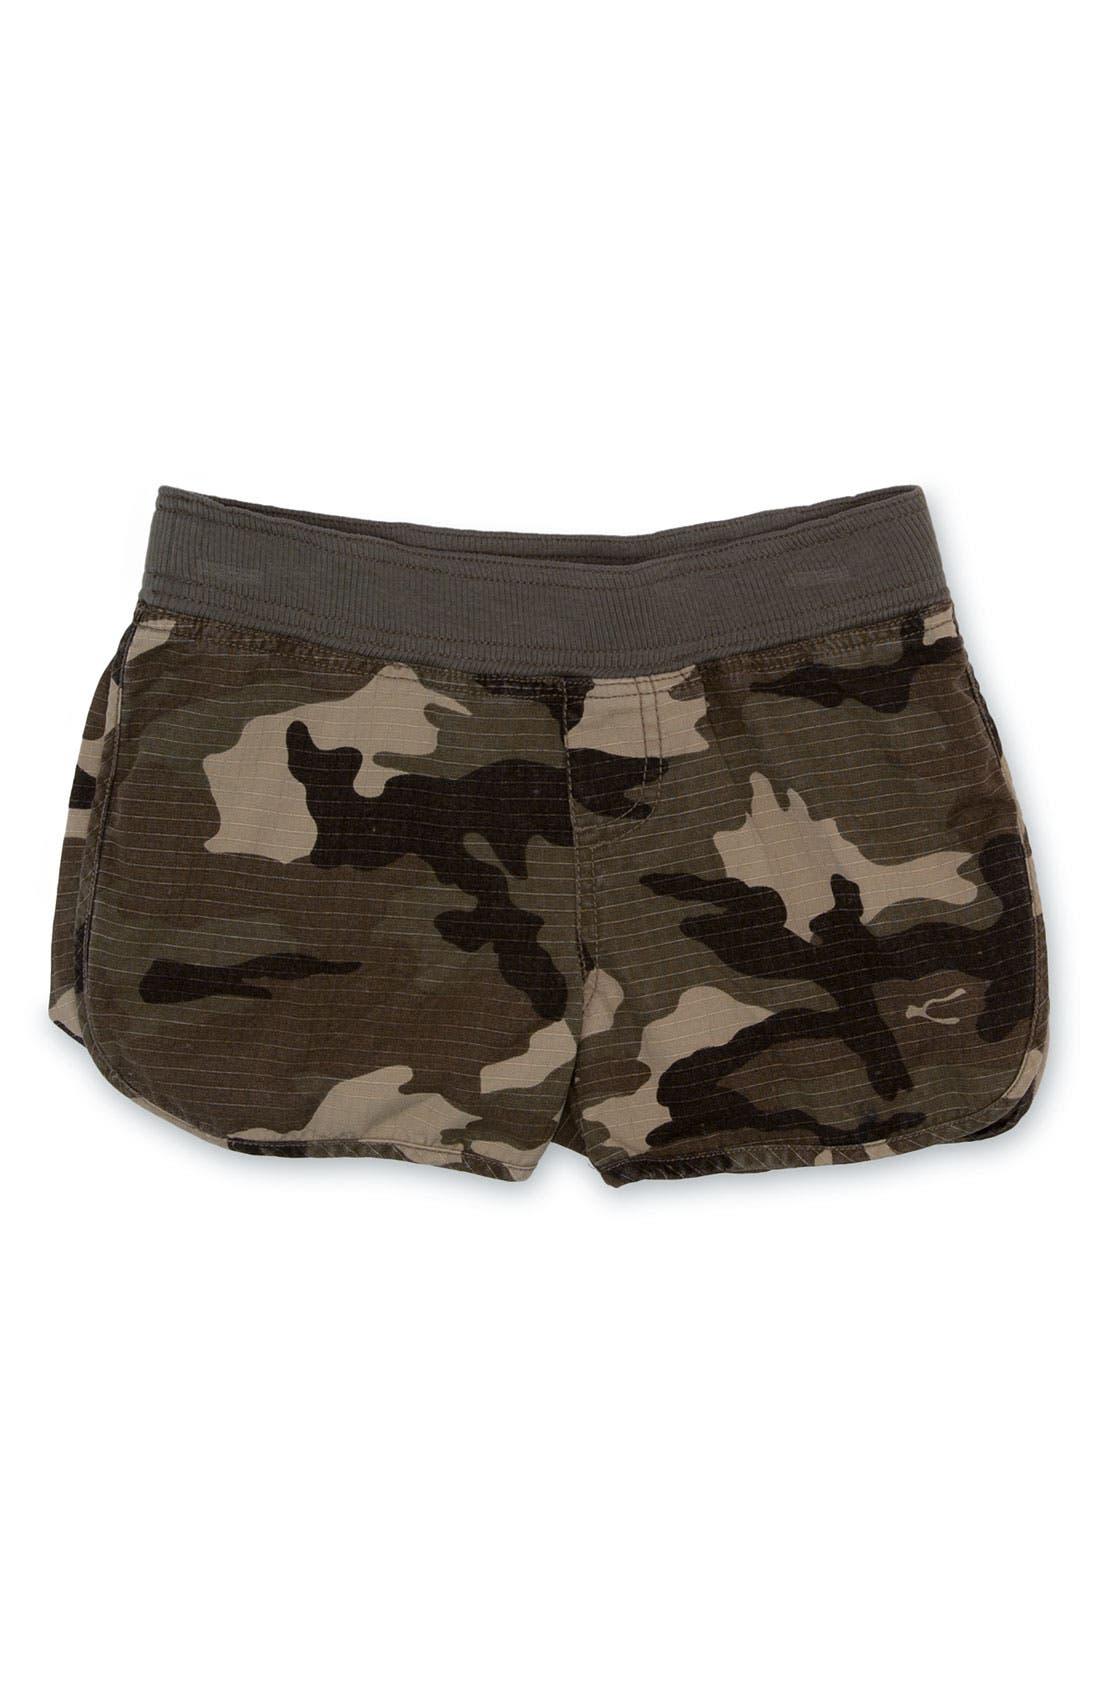 Peek 'Camo' Shorts,                             Main thumbnail 1, color,                             301